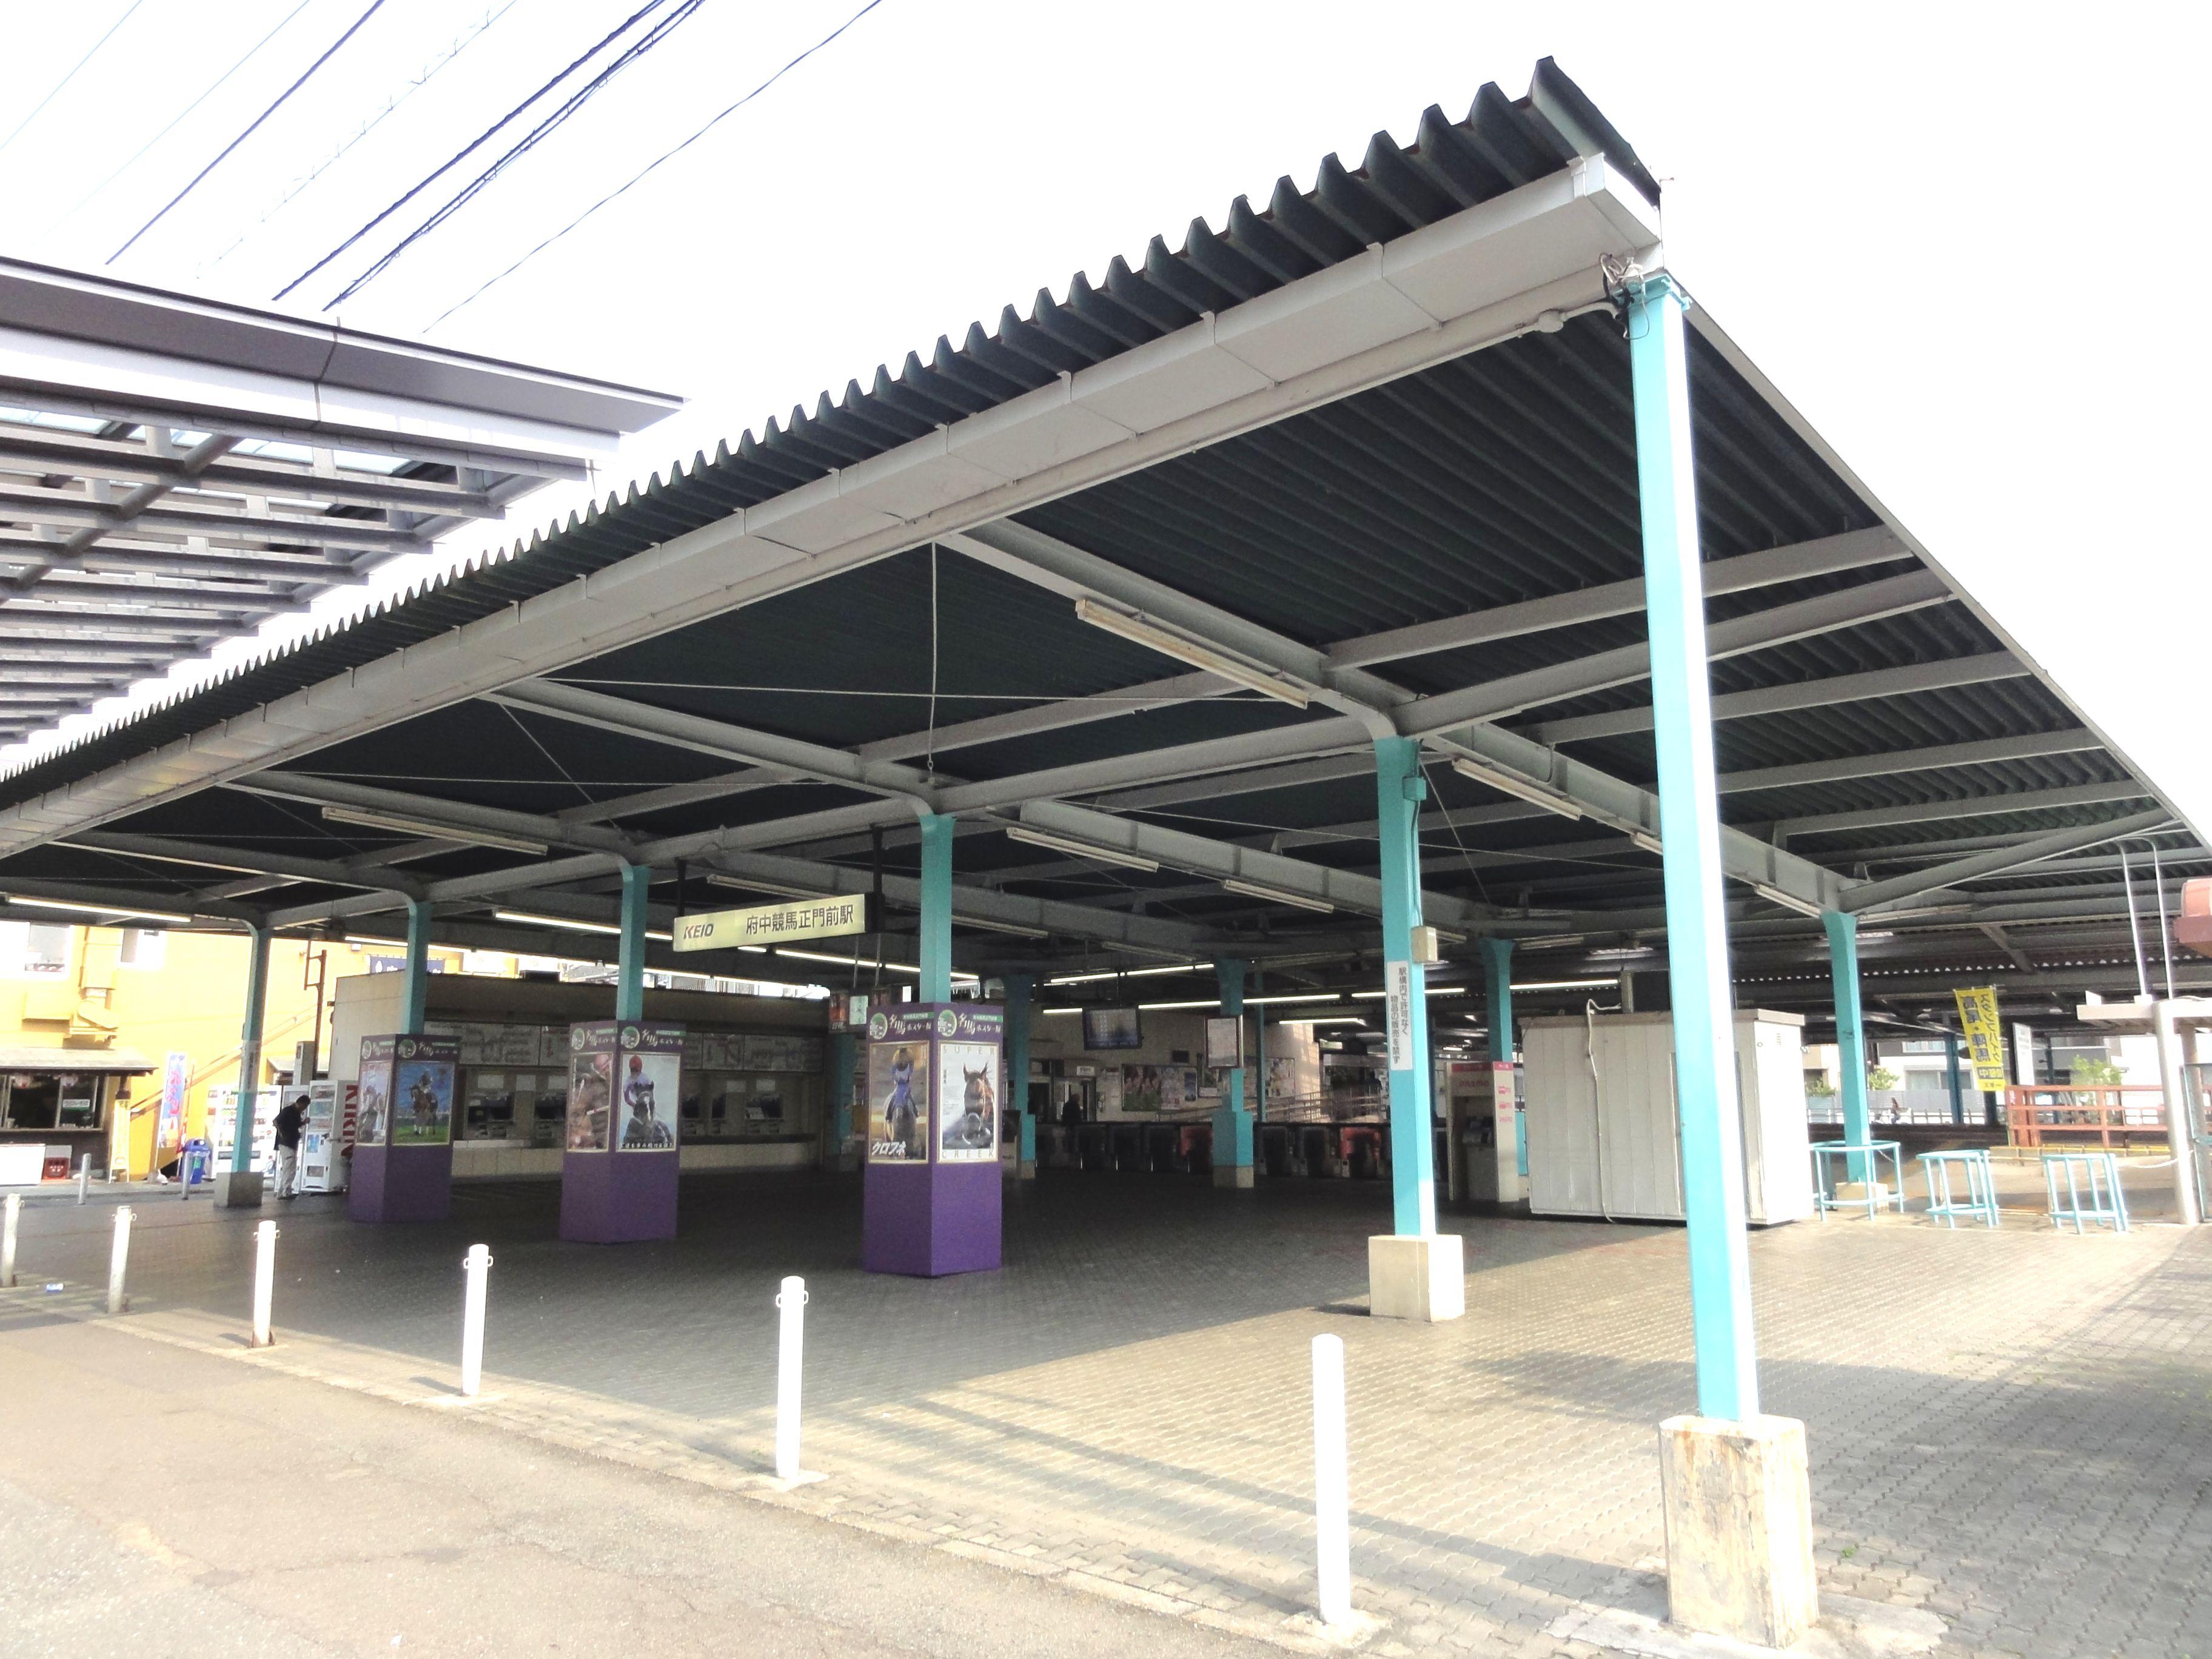 https://upload.wikimedia.org/wikipedia/commons/1/19/Fuchu-Keiba-Seimon-mae-Station_20120506.jpg